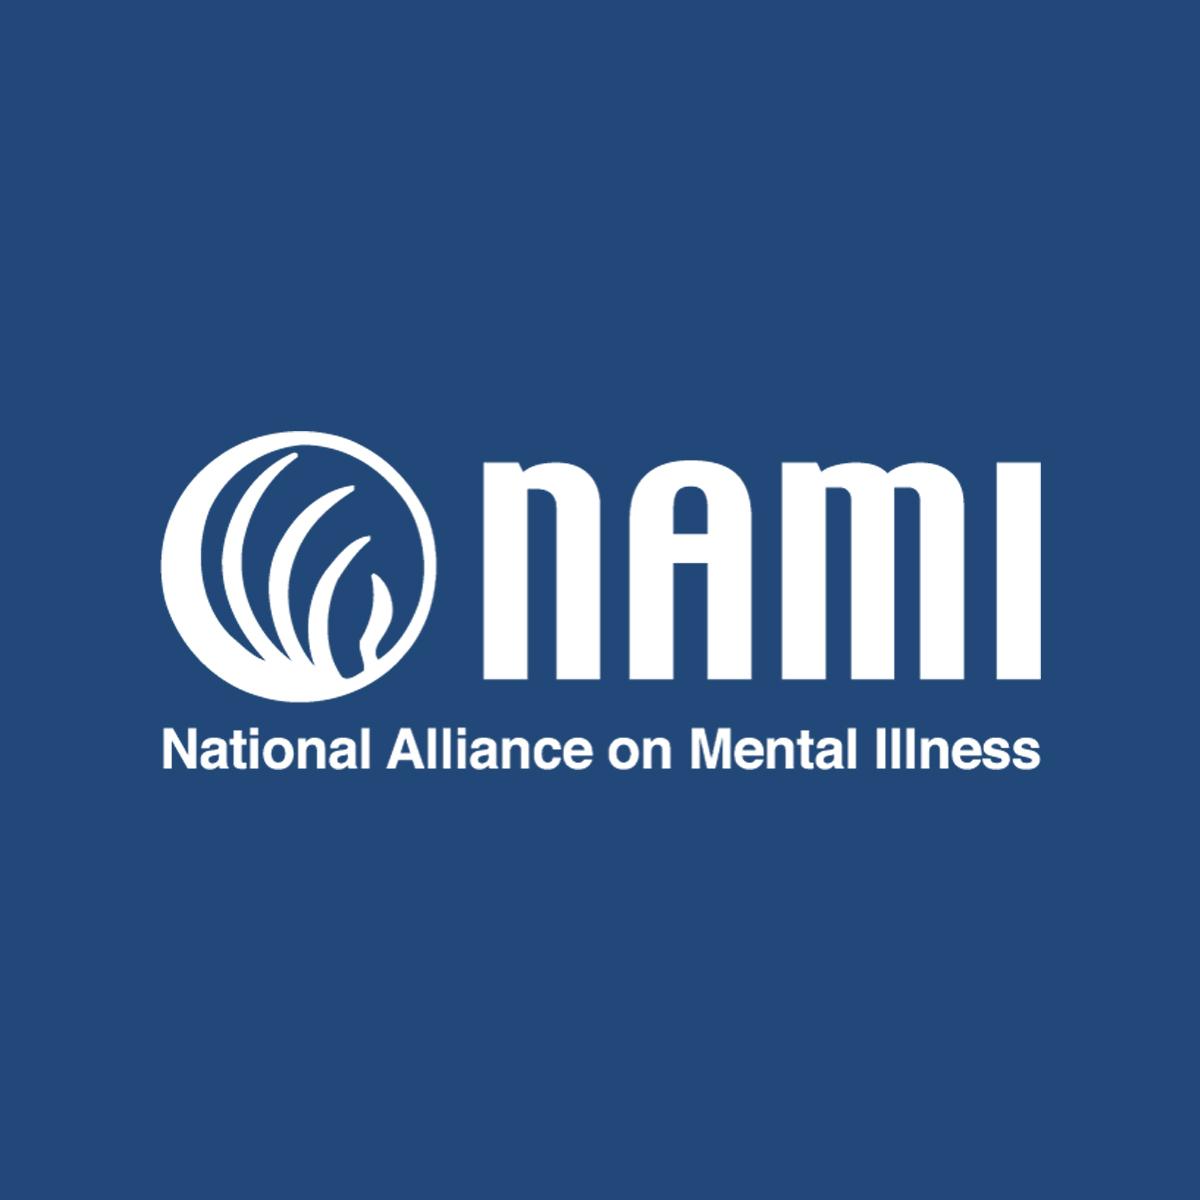 The National Alliance on Mental Illness